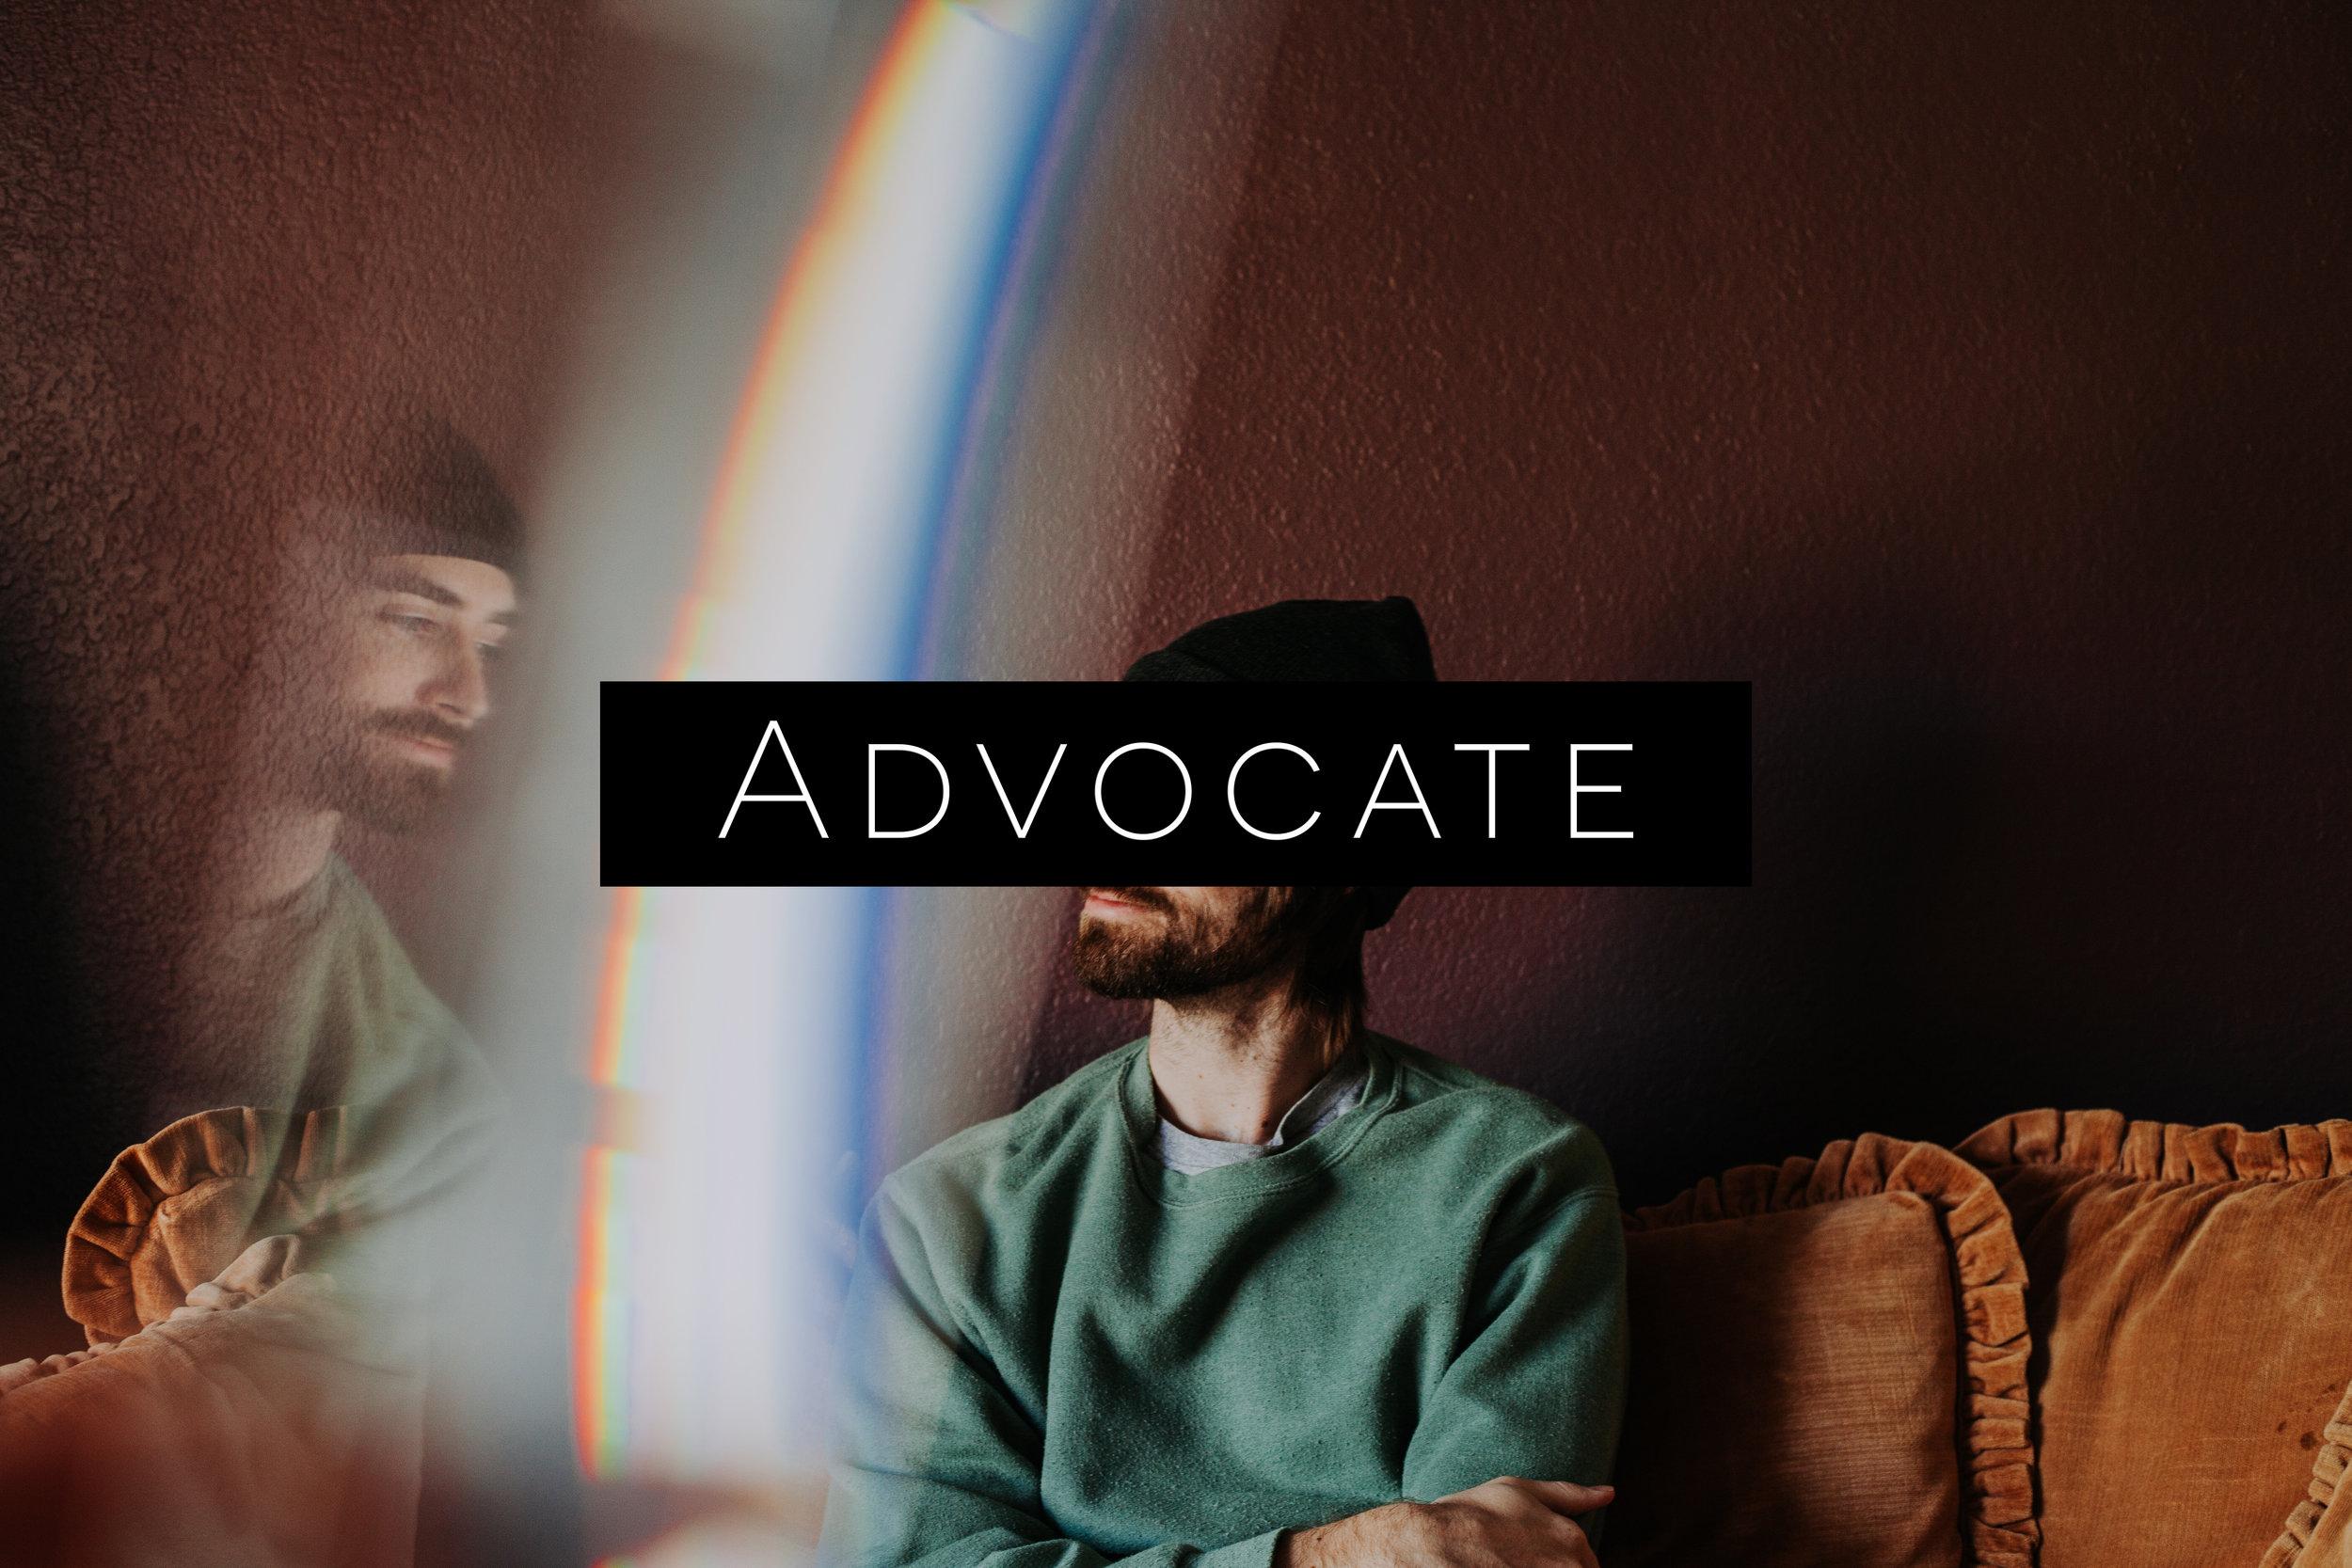 Advocate (thin text).jpg